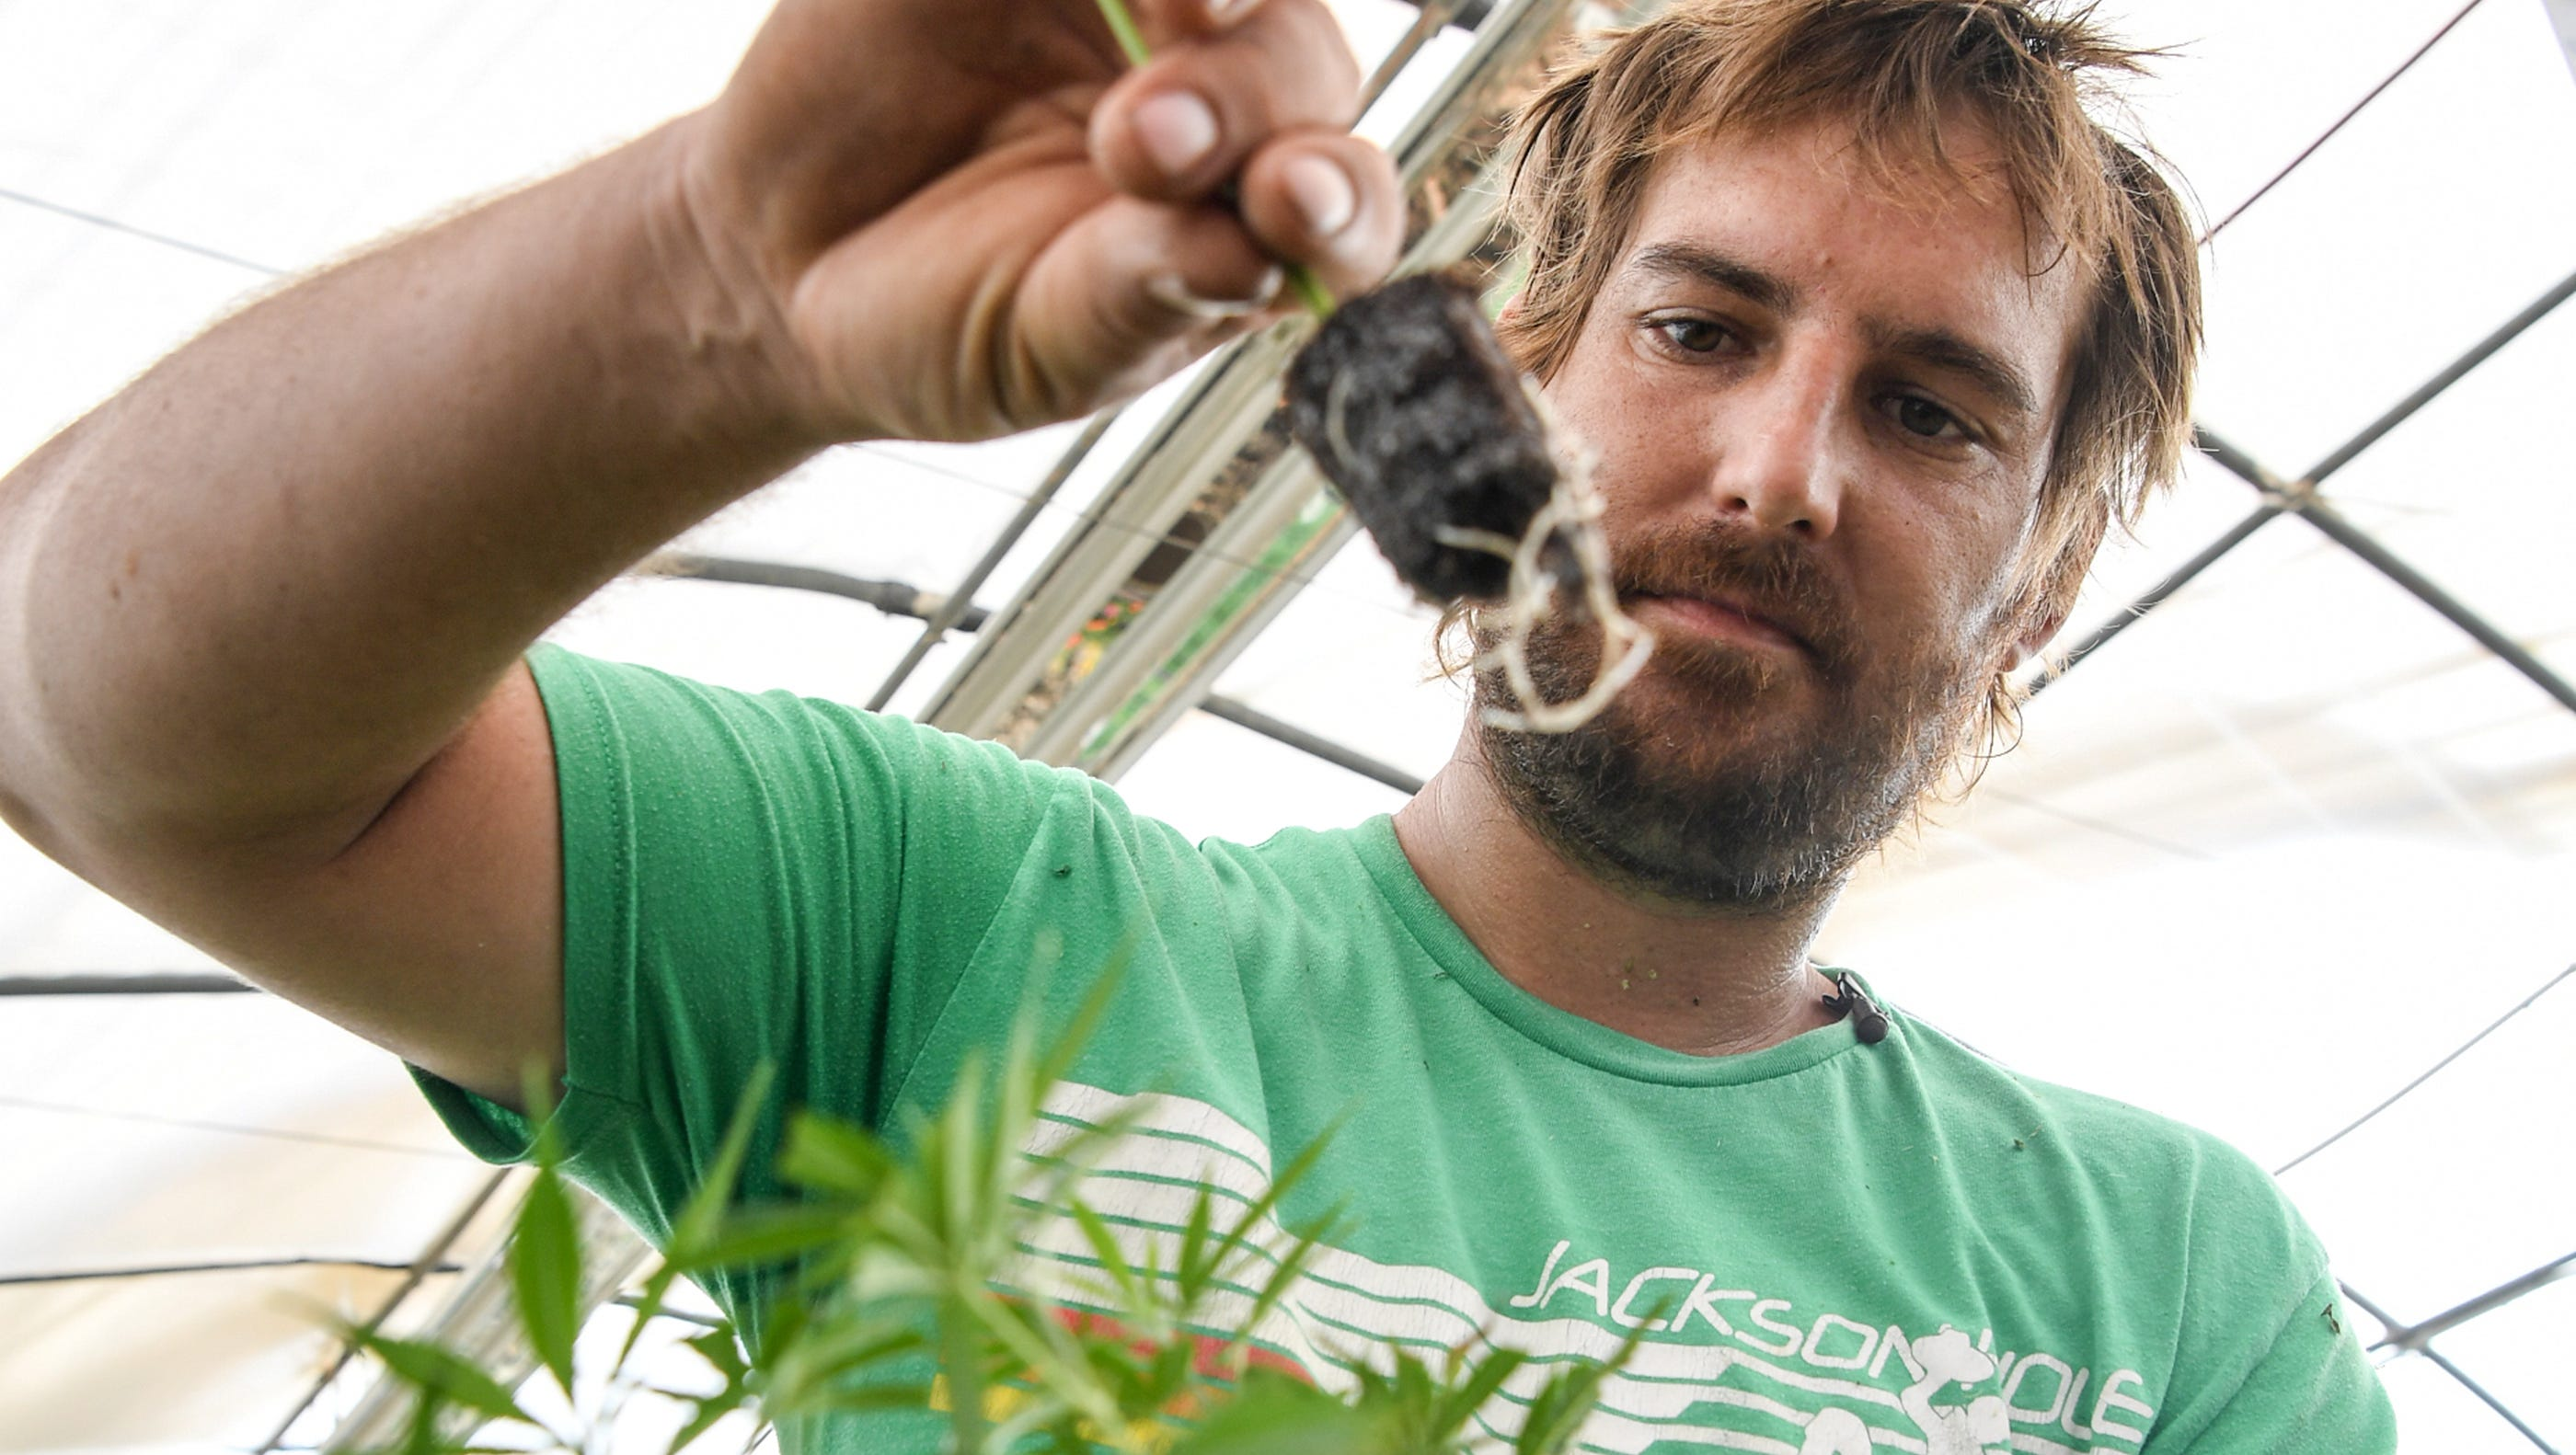 South Carolina Farmers Go All In For Hemp Despite Industry S Risks